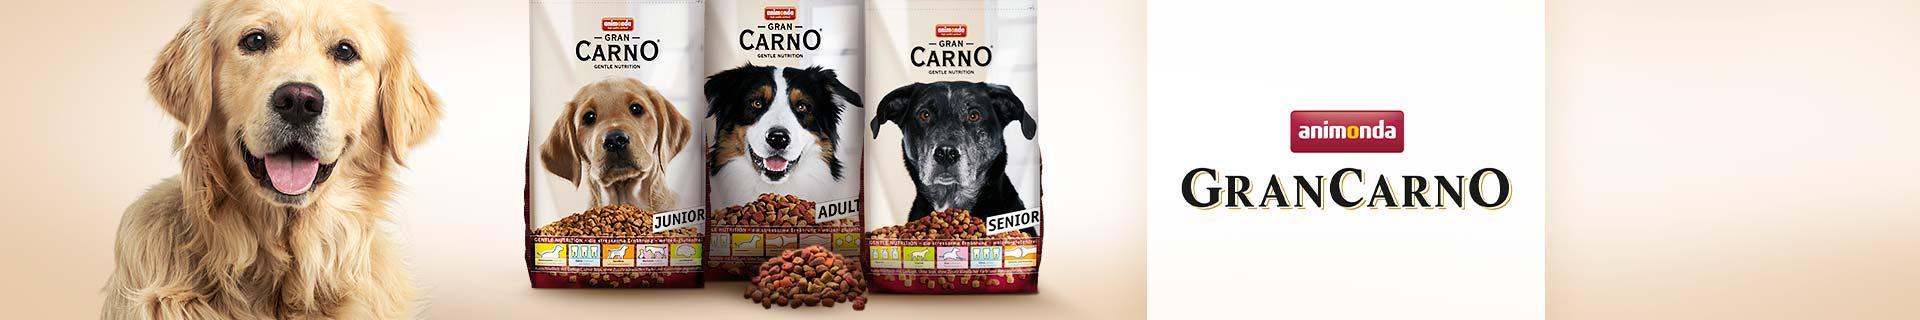 Animonda Hund Trockenfutter GranCarno